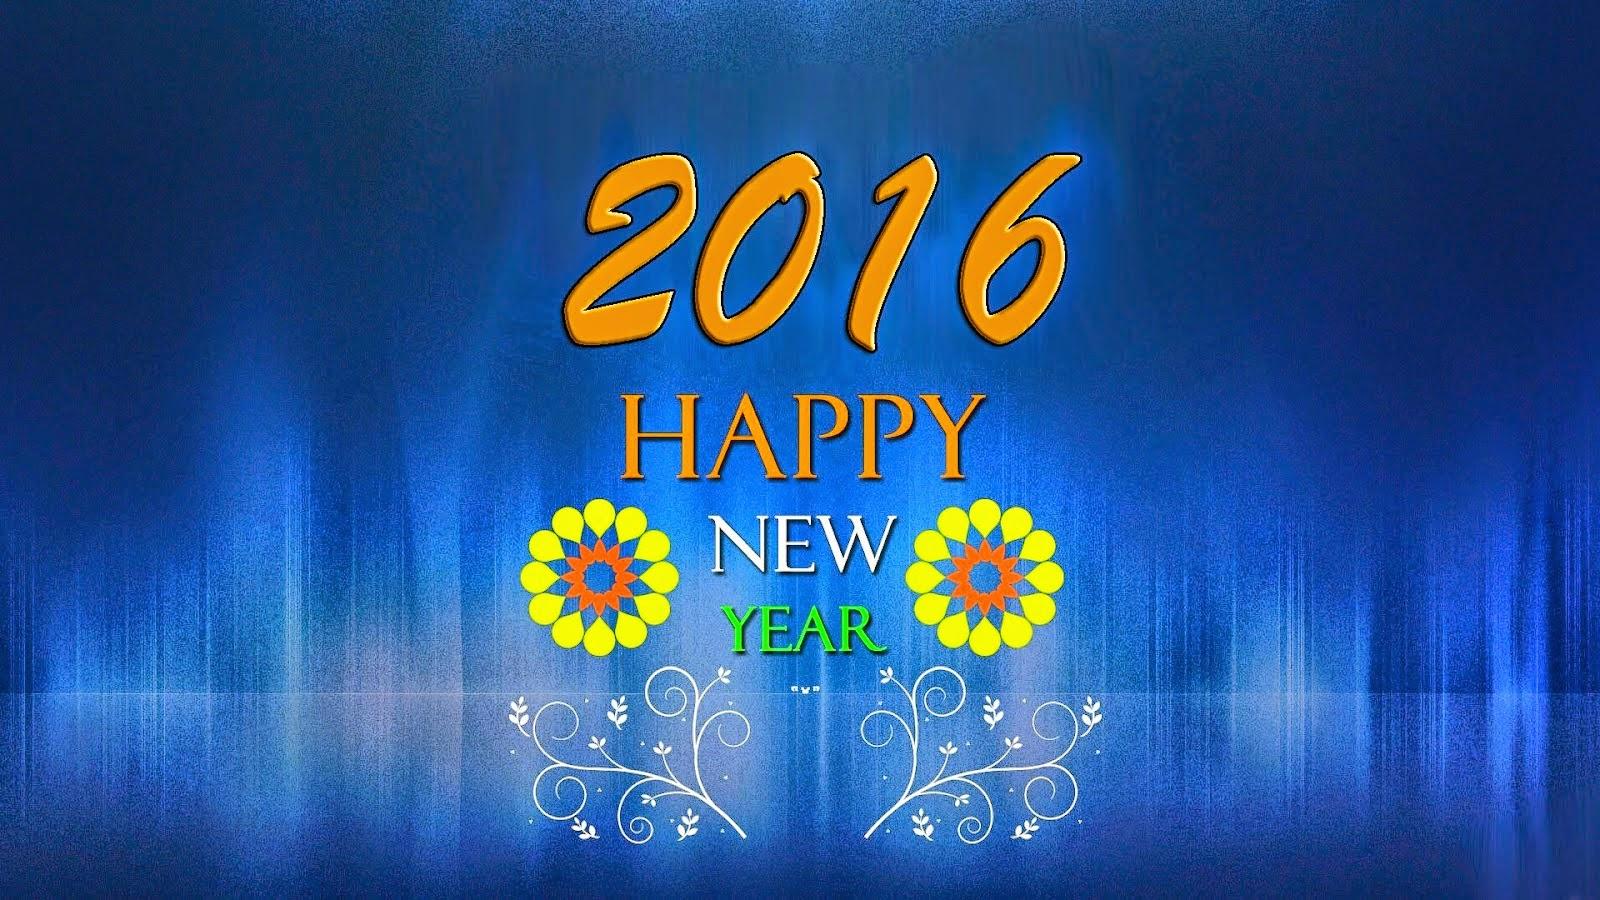 happy-new-year-2015-wallpaper (11).jpg